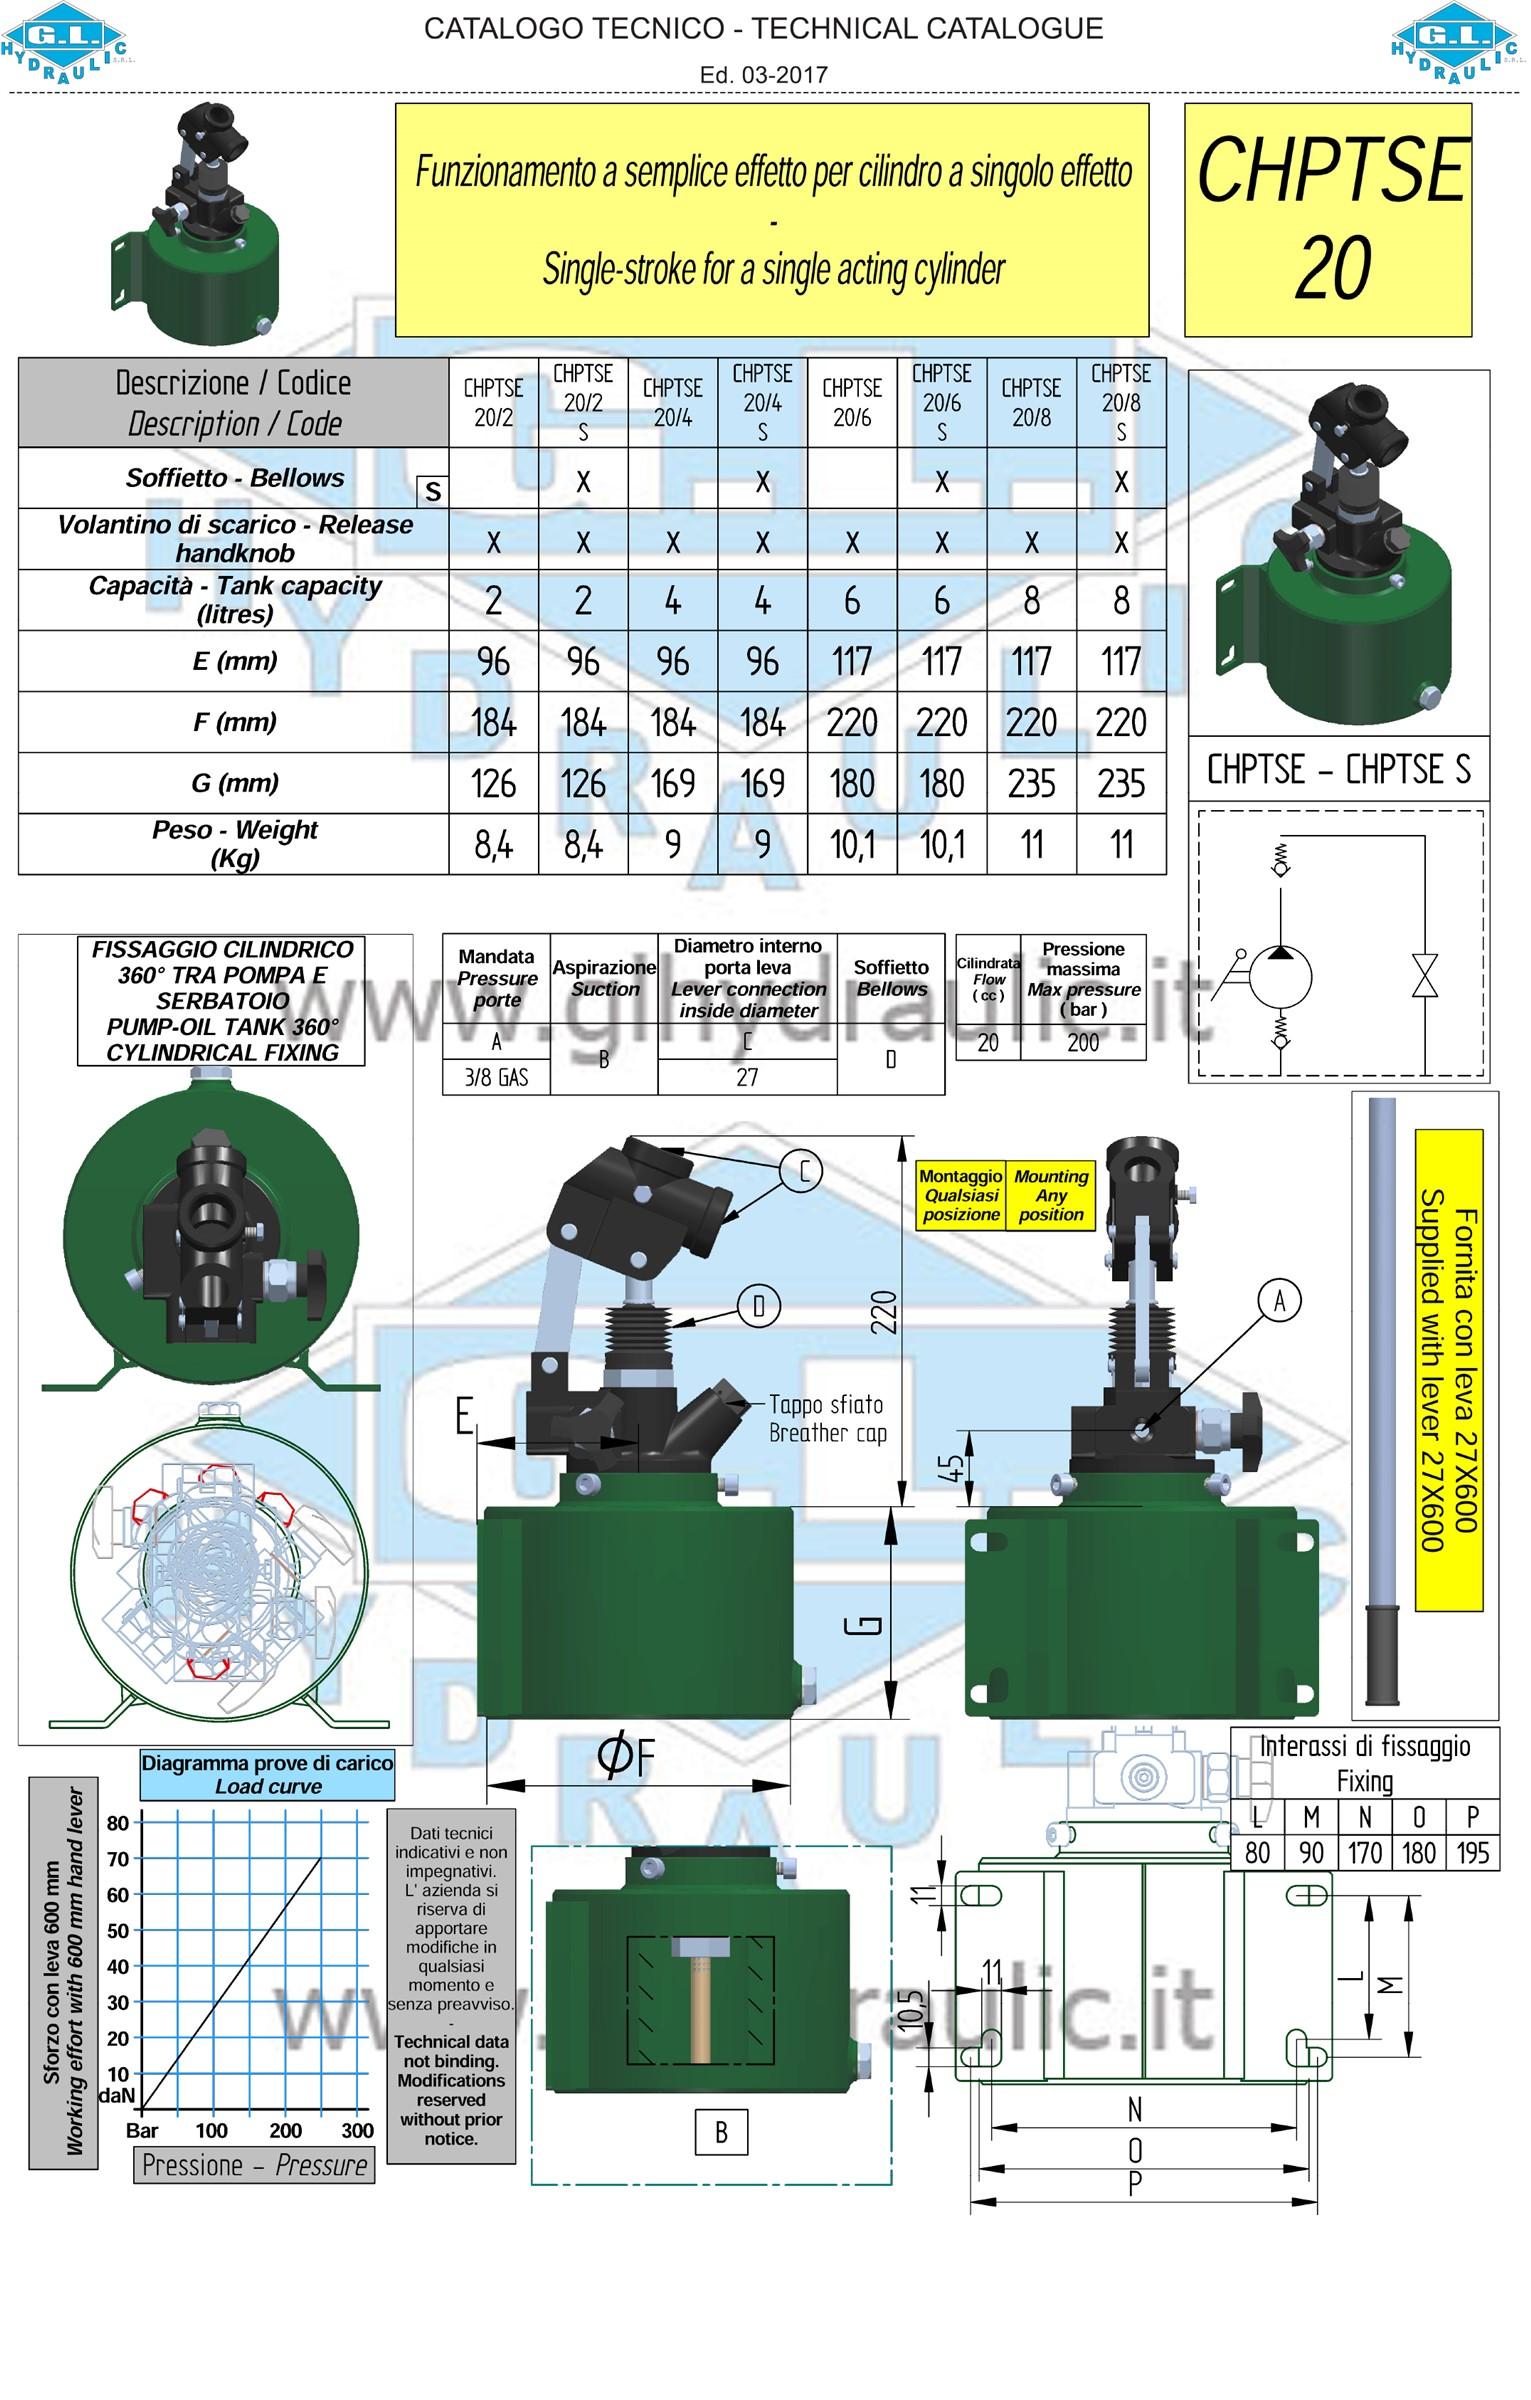 LED 7-Segment Anzeige 0,5 Inch ROT 6 Stück DIS1306-1 Digit